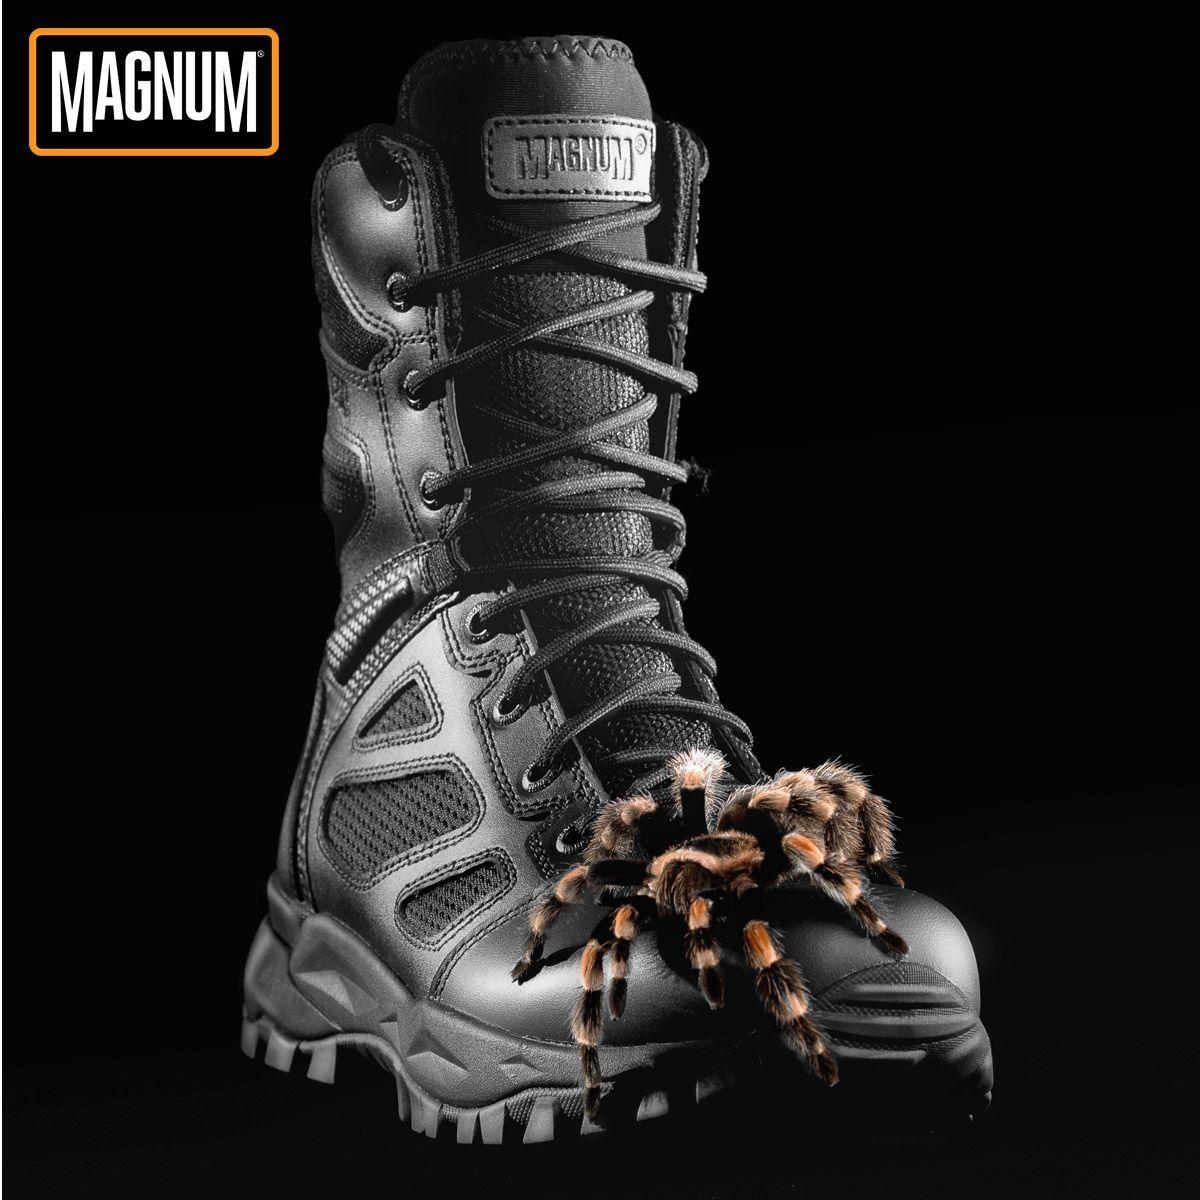 2ce6724964d Magnum Elite Spider X 8.0 SZ Boots | car | Boots, Hiking boots ...